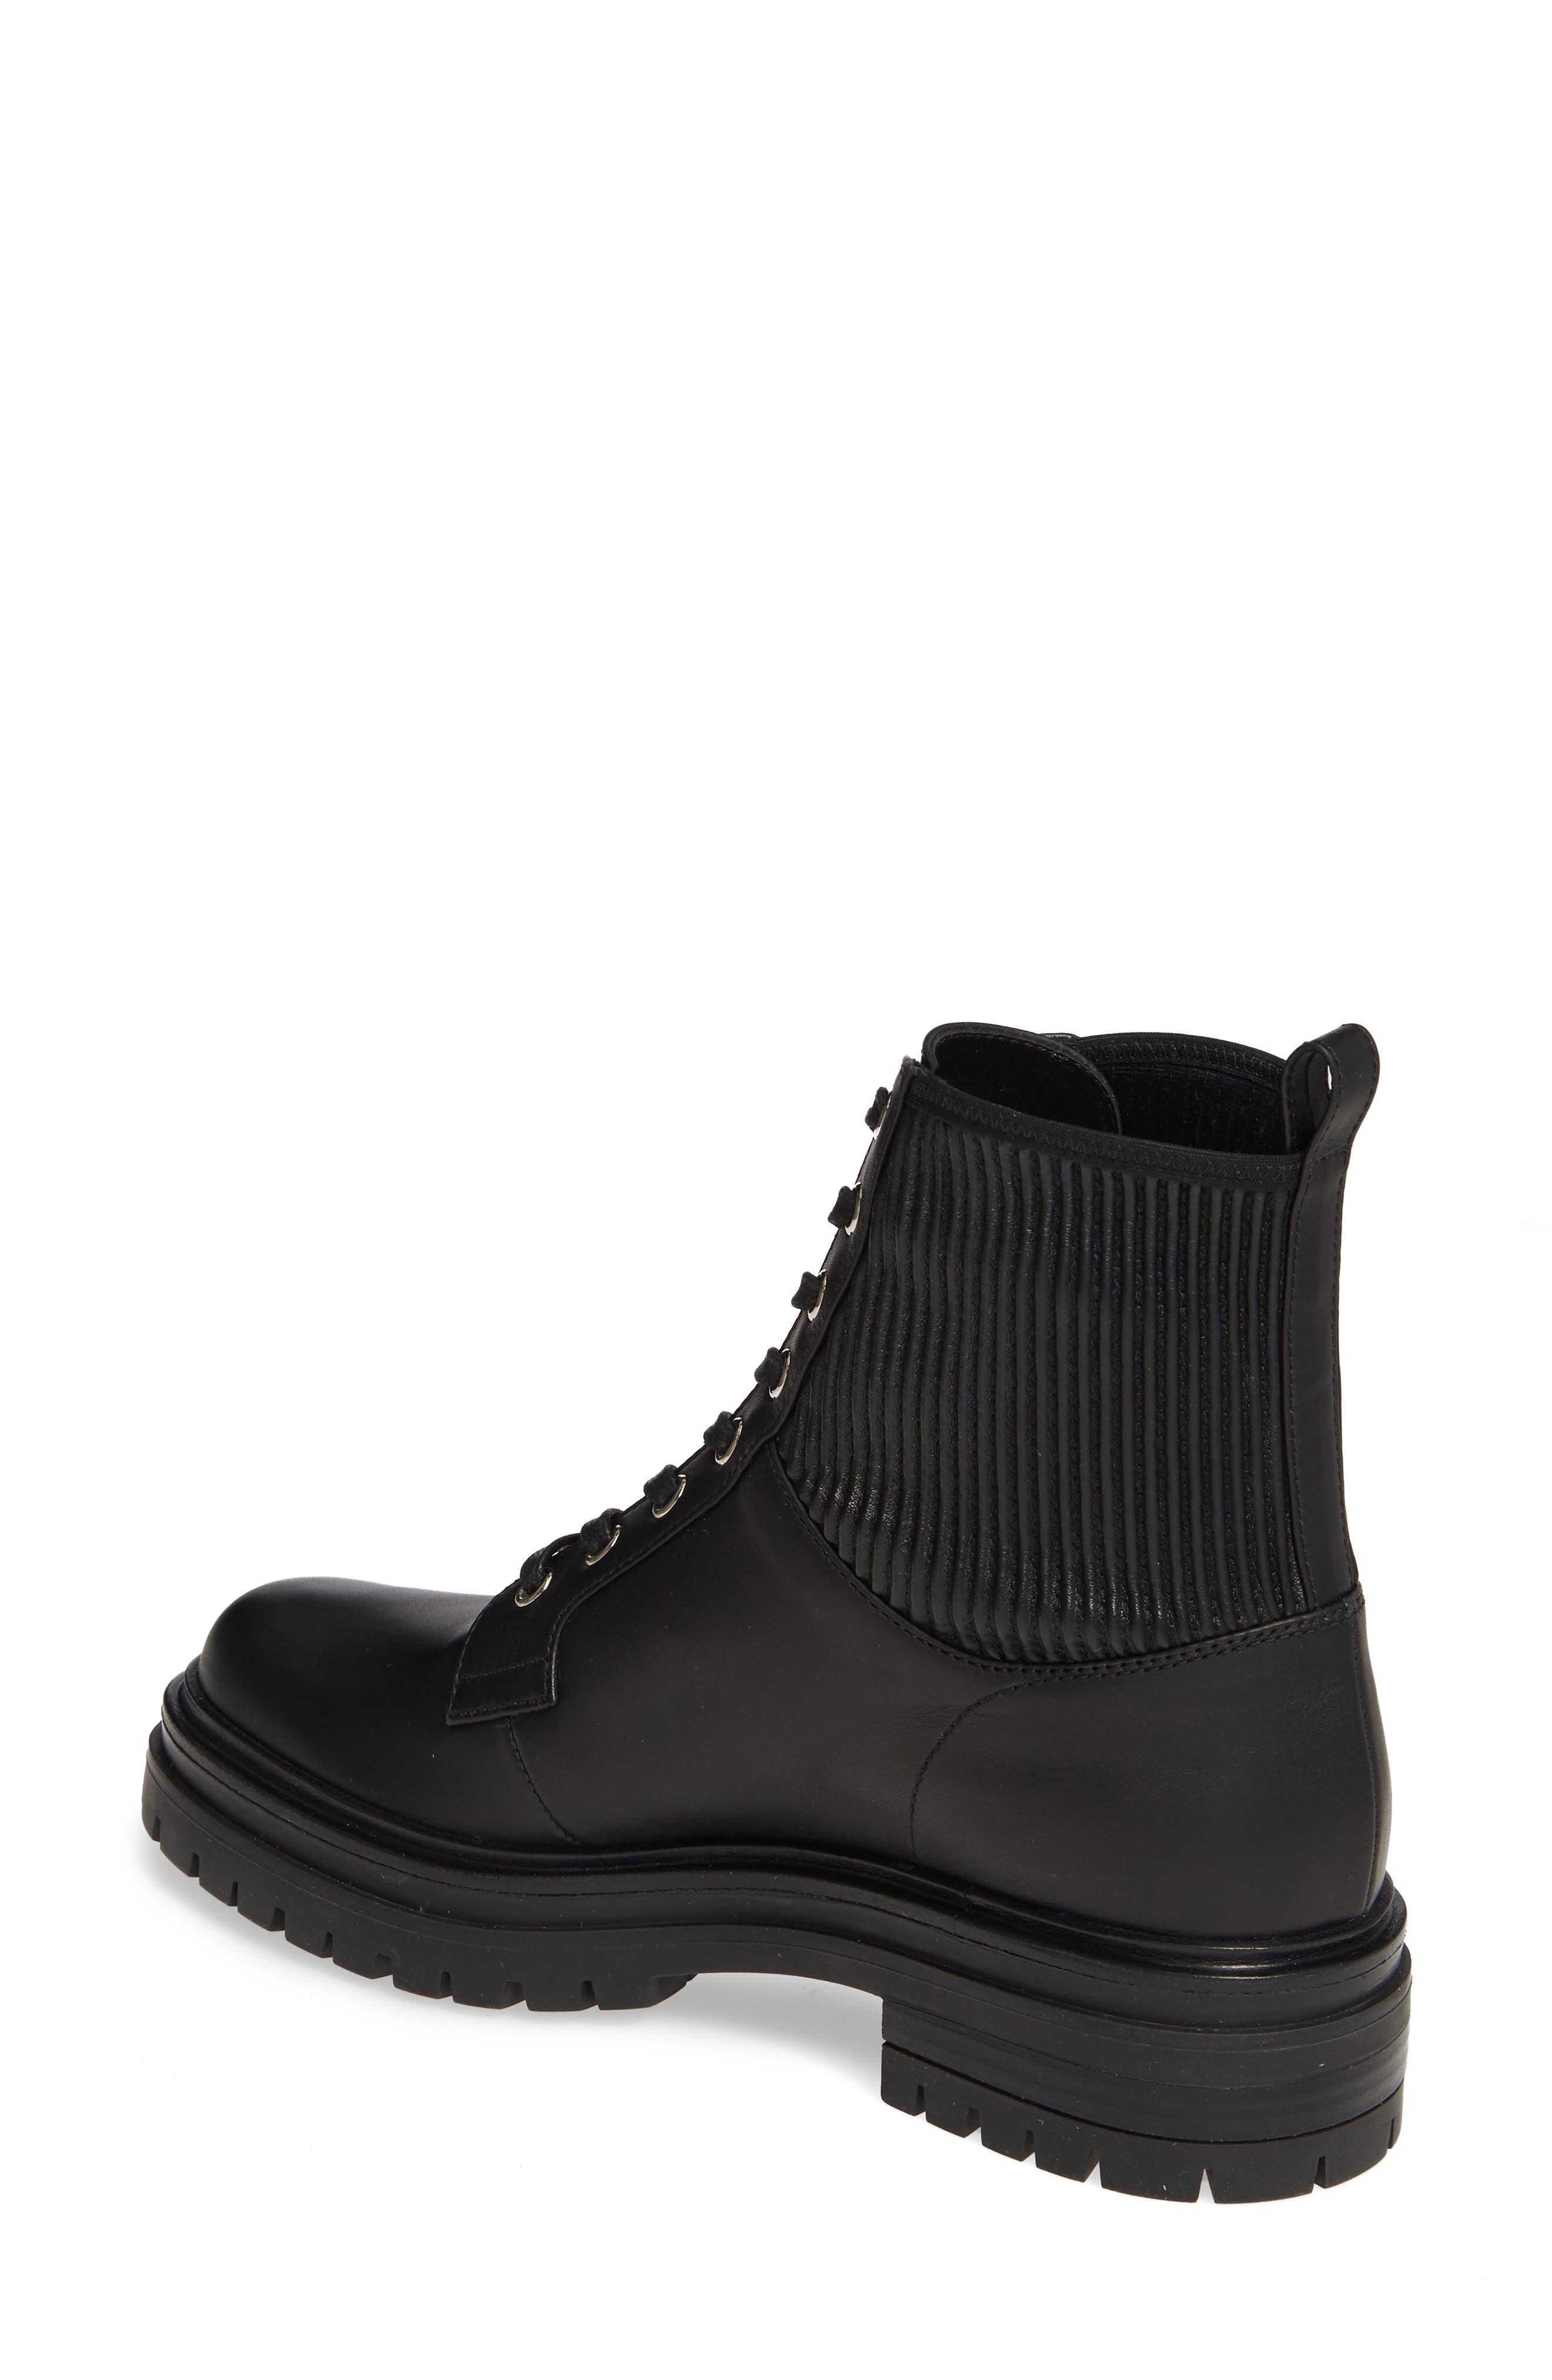 GIANVITO ROSSI, Combat Boot, Alternate thumbnail 2, color, BLACK